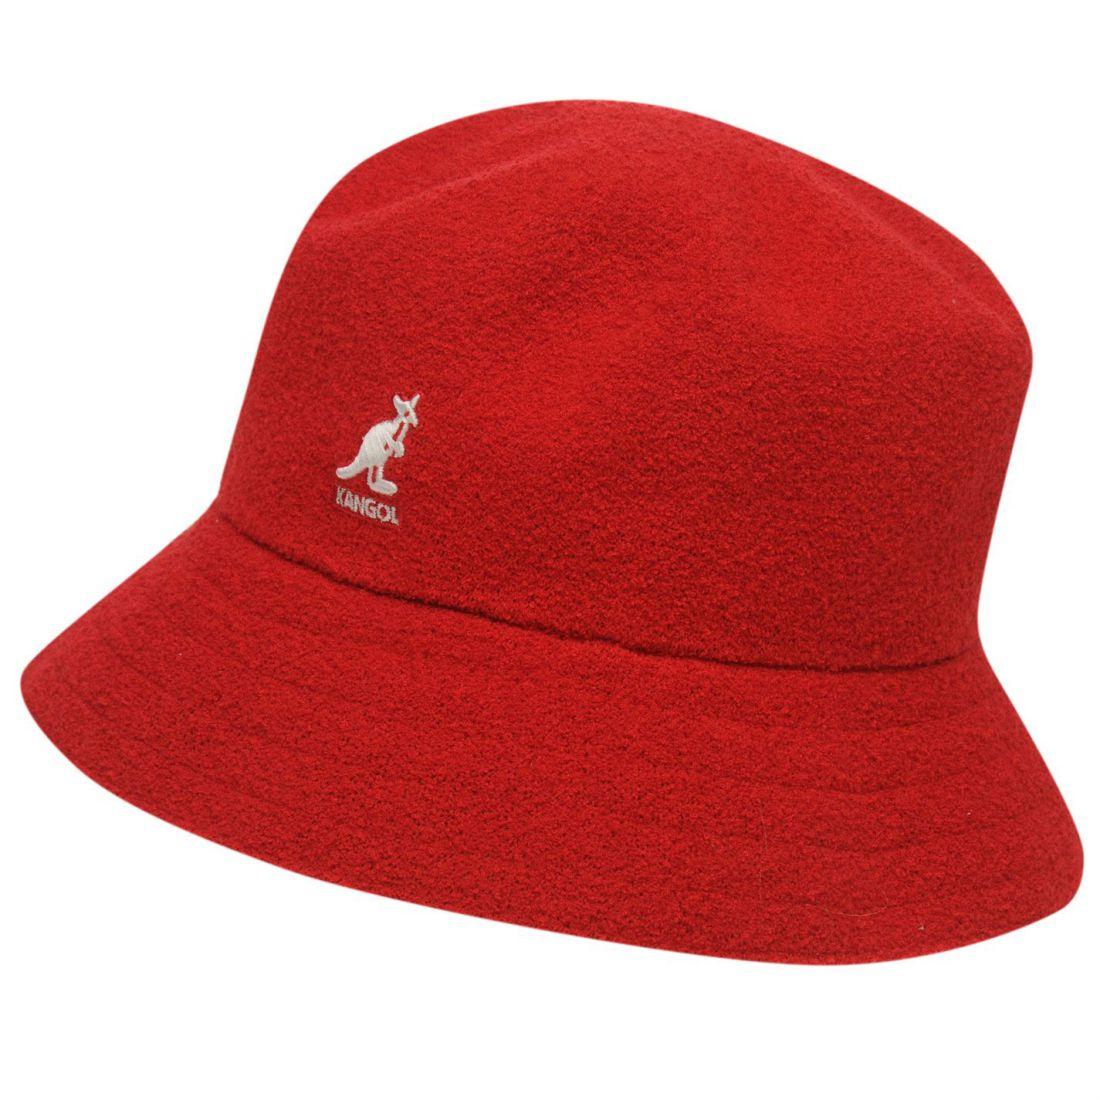 Kangol Boucle Bucket Hat Mens Gents  a2b9cd37284